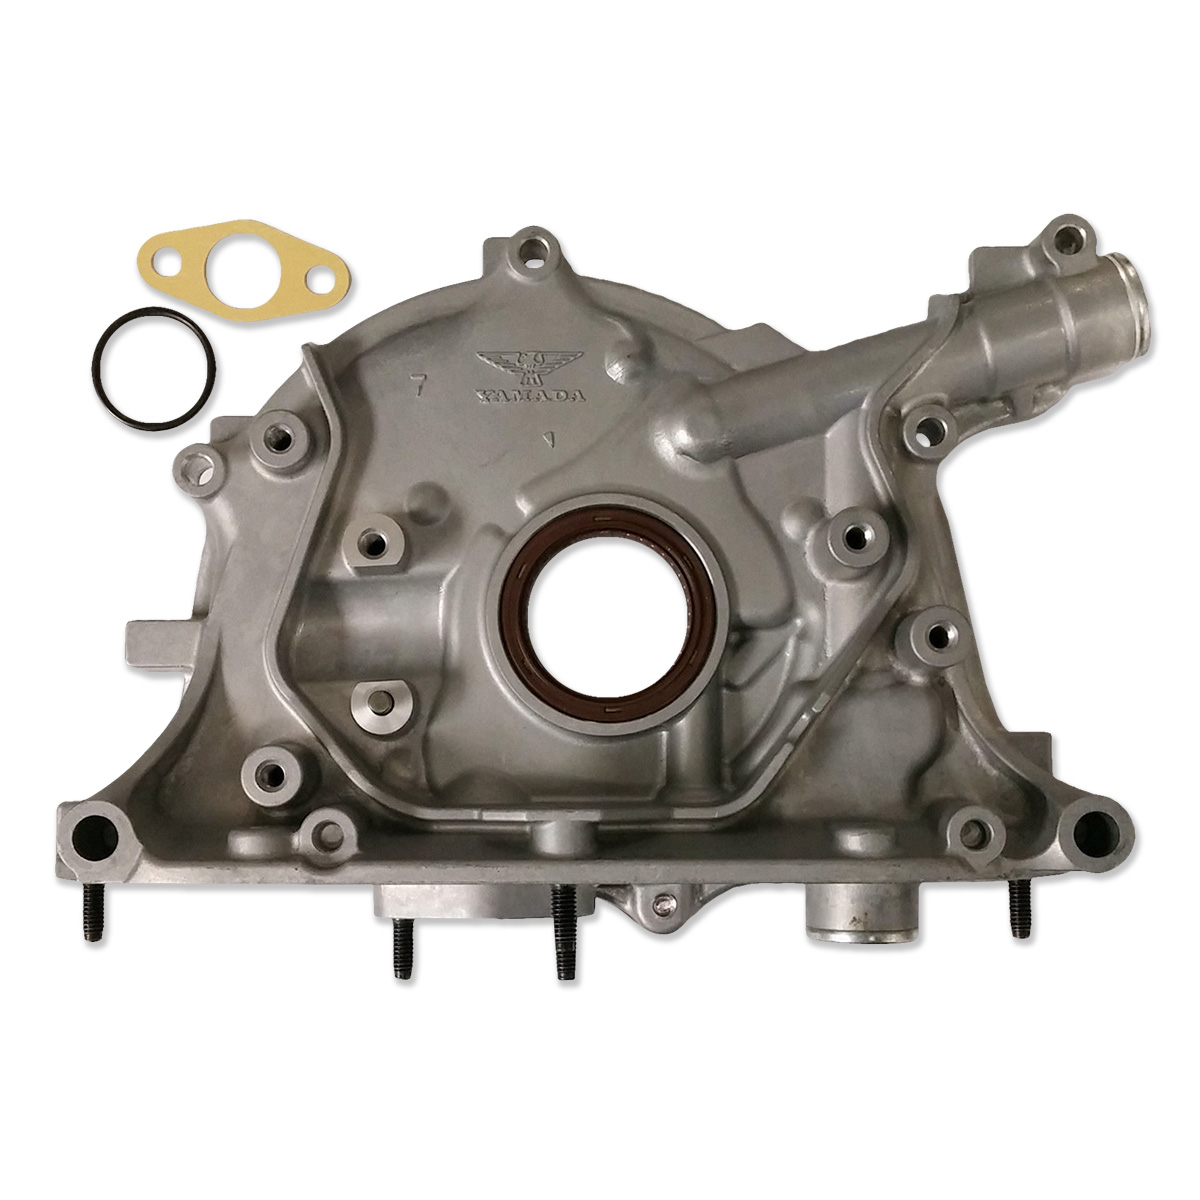 Oem Integra Type R Oil Pump Honda Acura B Series Boost Resource